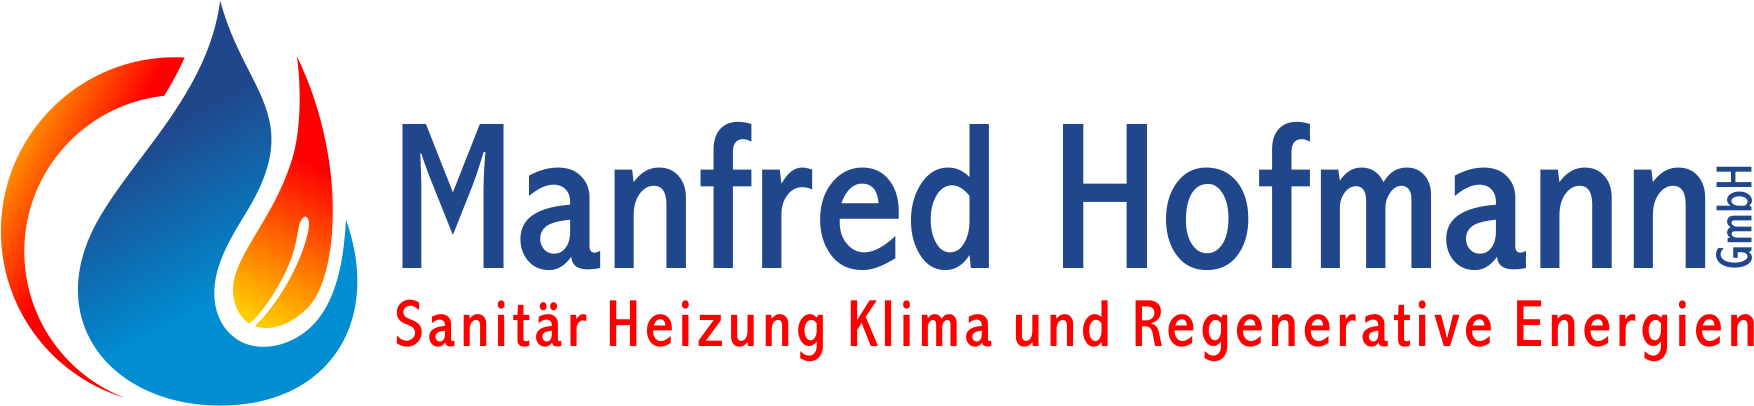 Manfred Hofmann GmbH